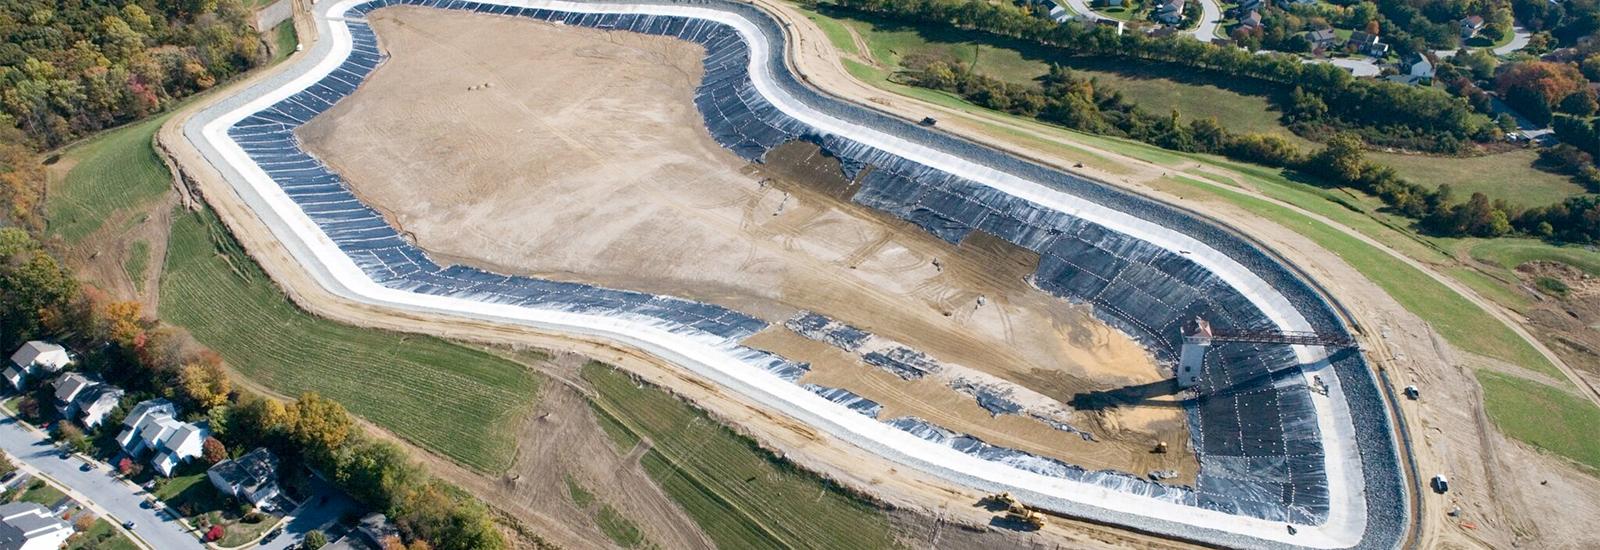 Newark Reservoir aerial